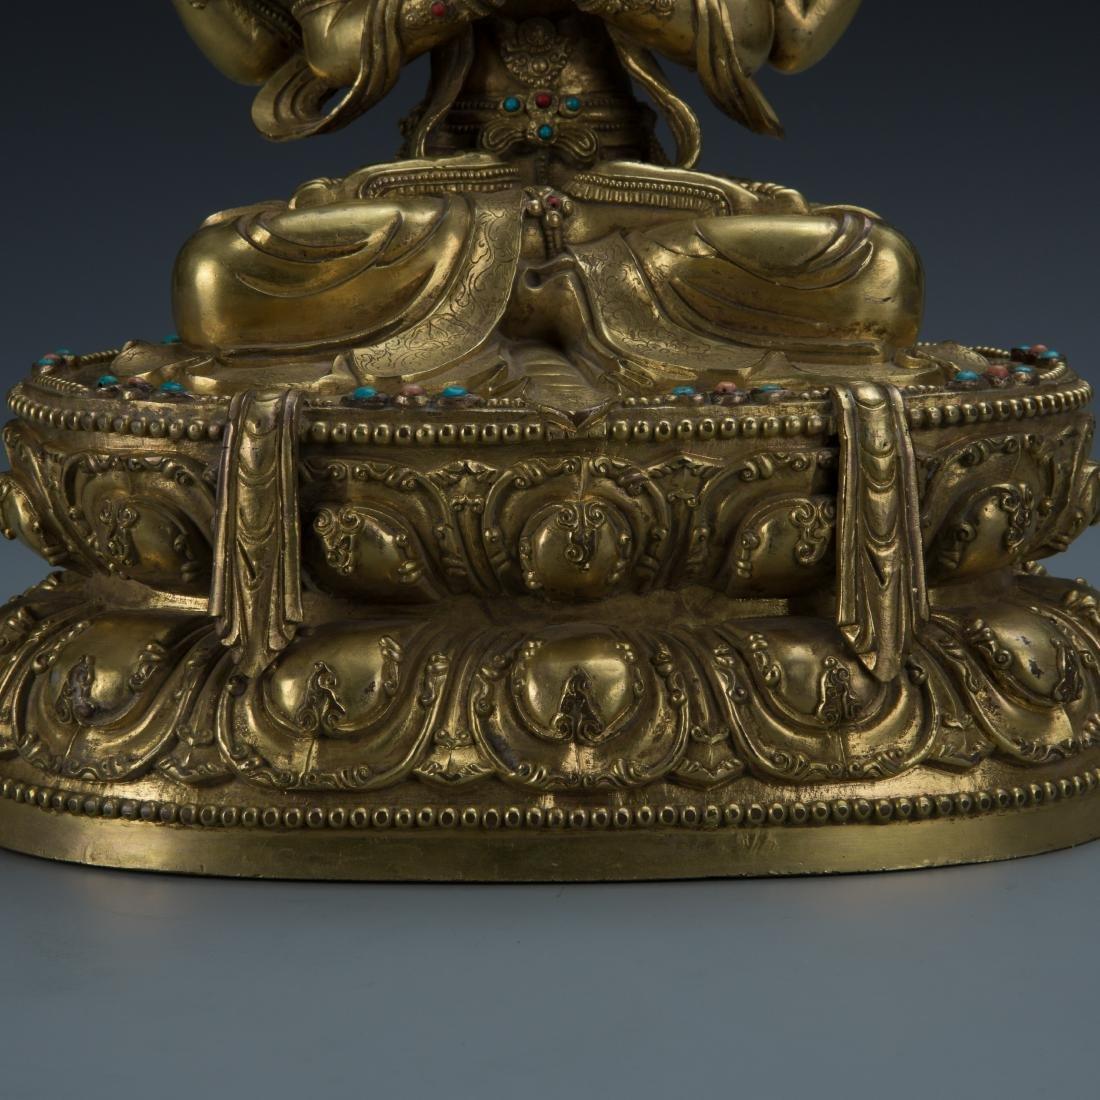 A Gilt-Bronze Figure of Sadaksari Avalokitesvara, Tibet - 3